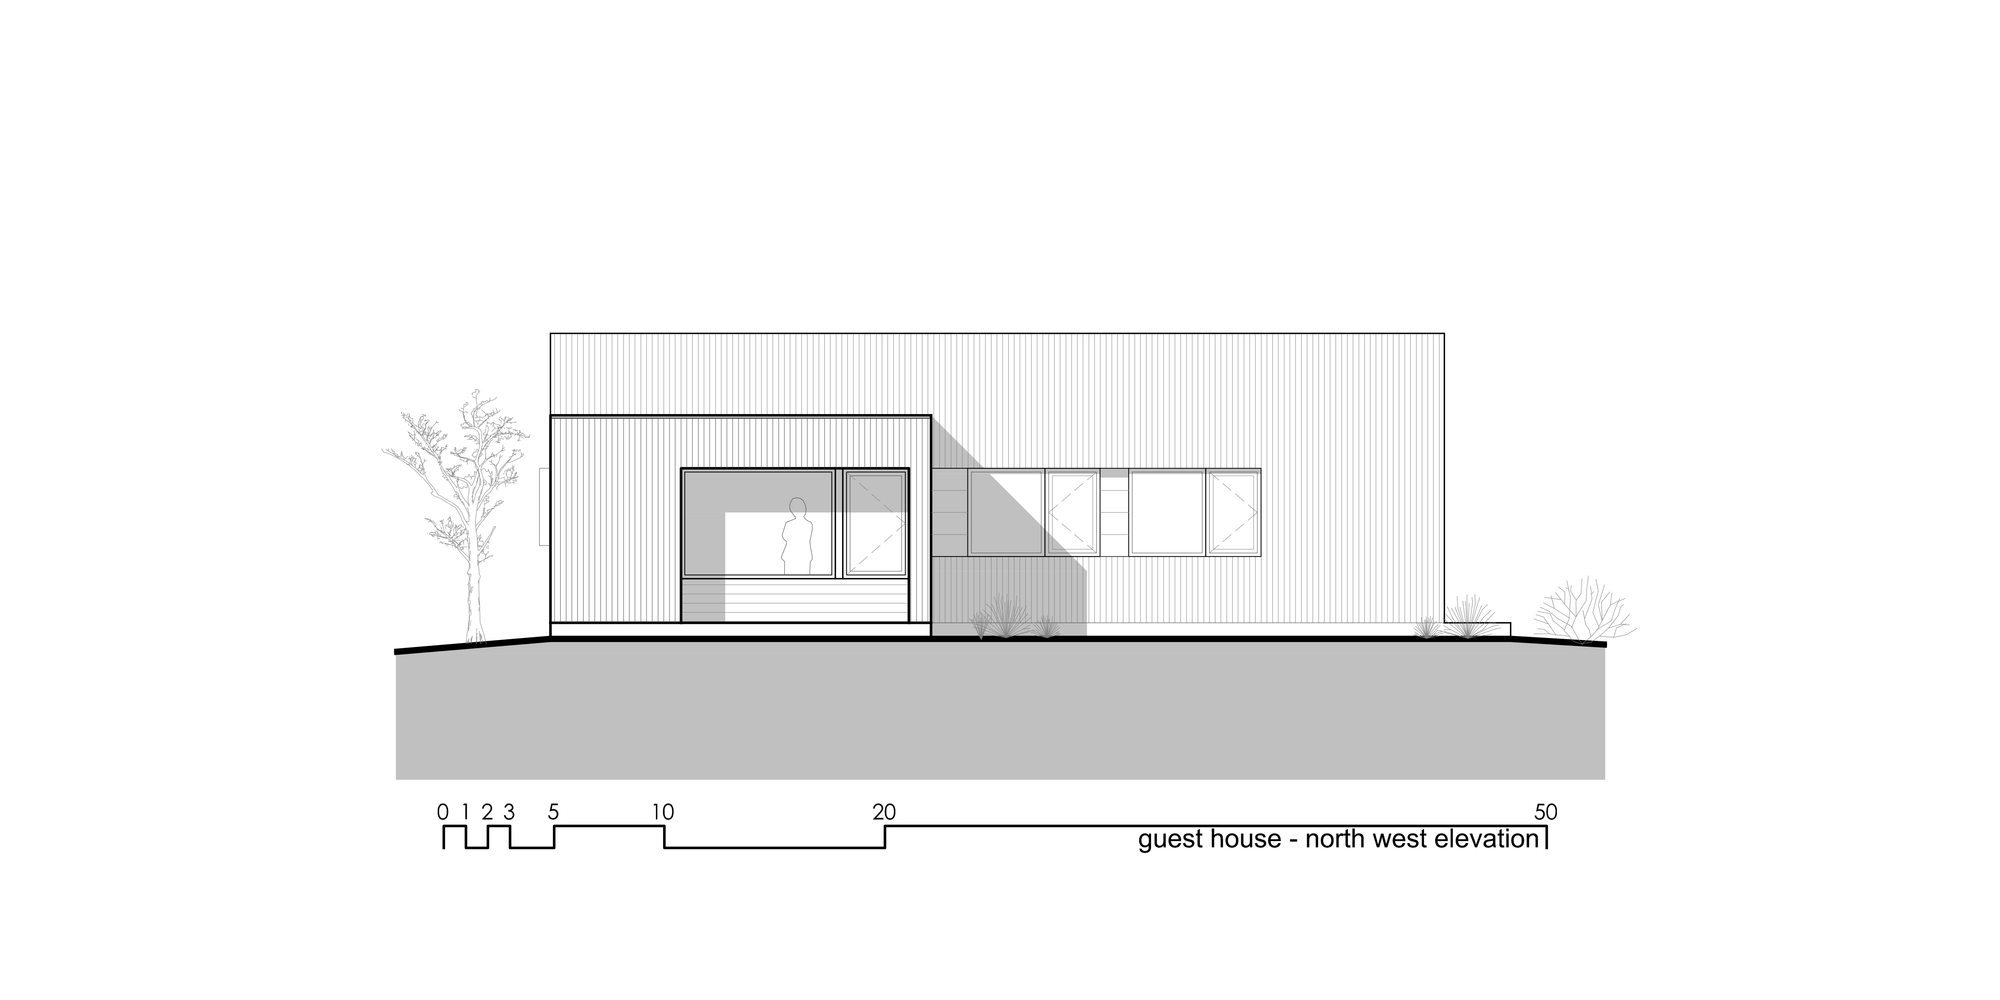 5522fe78e58ecea119000077_capitol-reef-desert-dwelling-imbue-design_40_guest_house_-_elevation_north_west